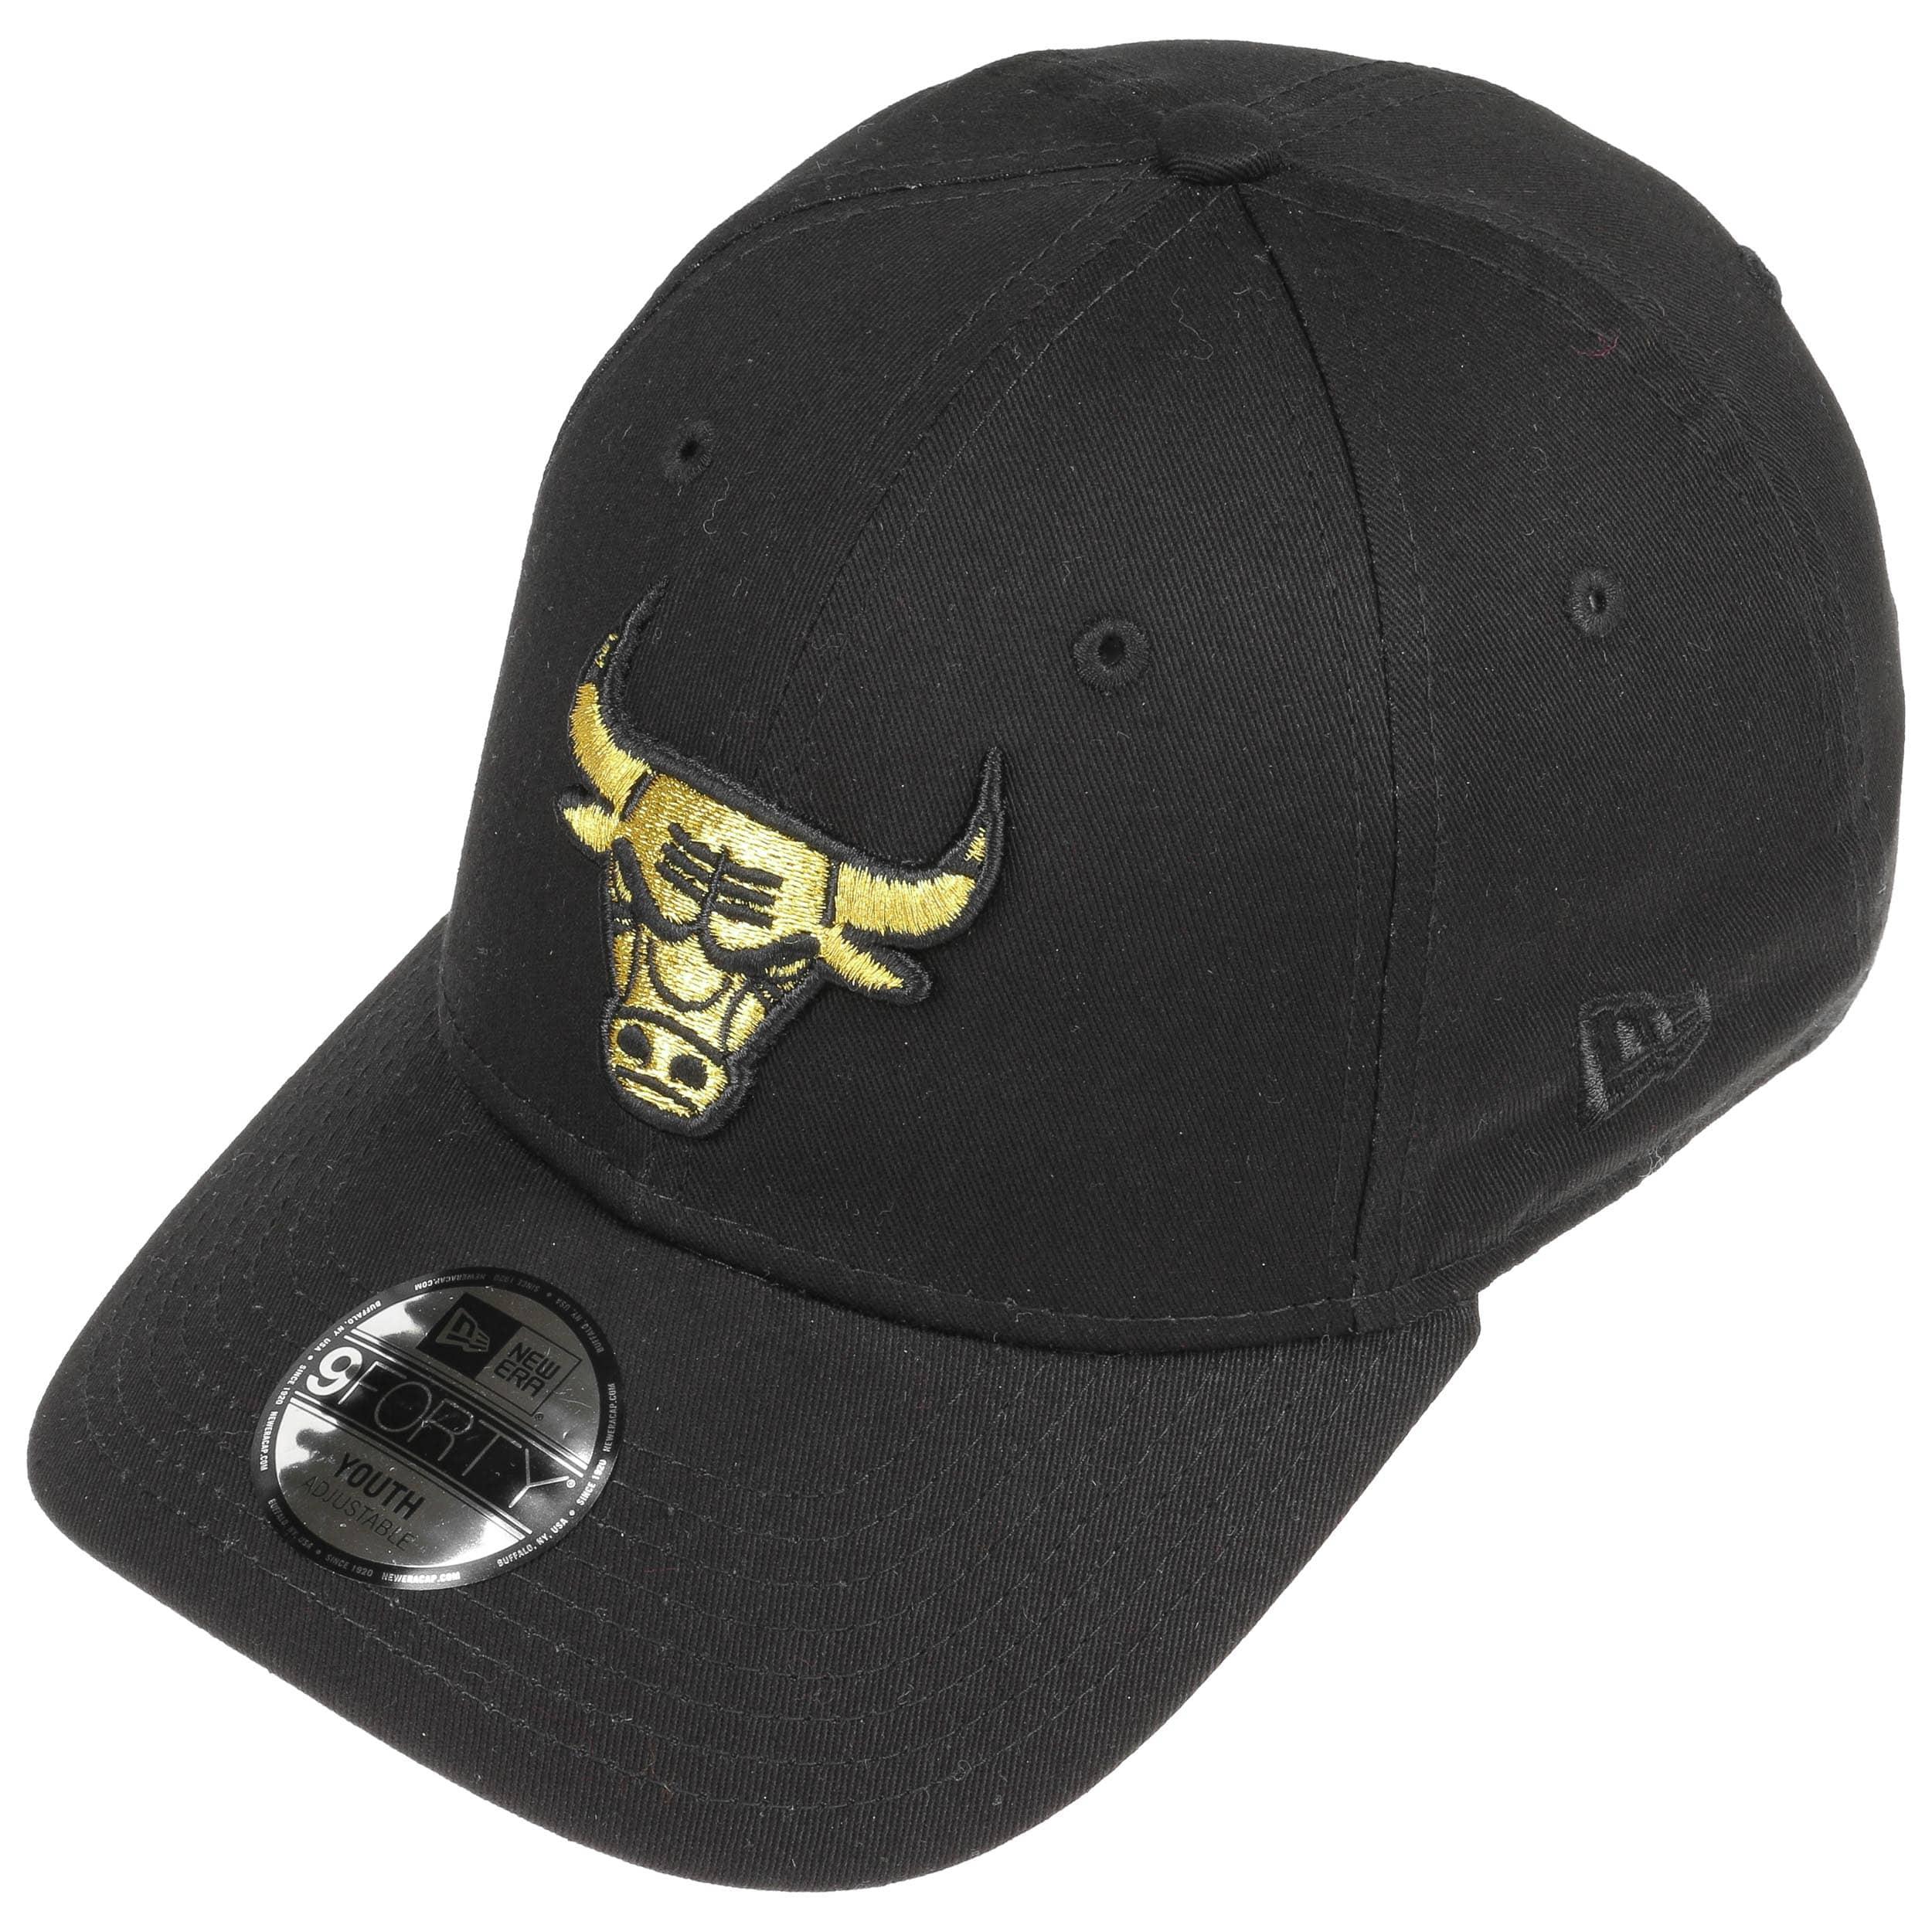 349ba53f0e4 Gorra 9Forty Junior Golden Bulls by New Era - Gorras - sombreroshop.es